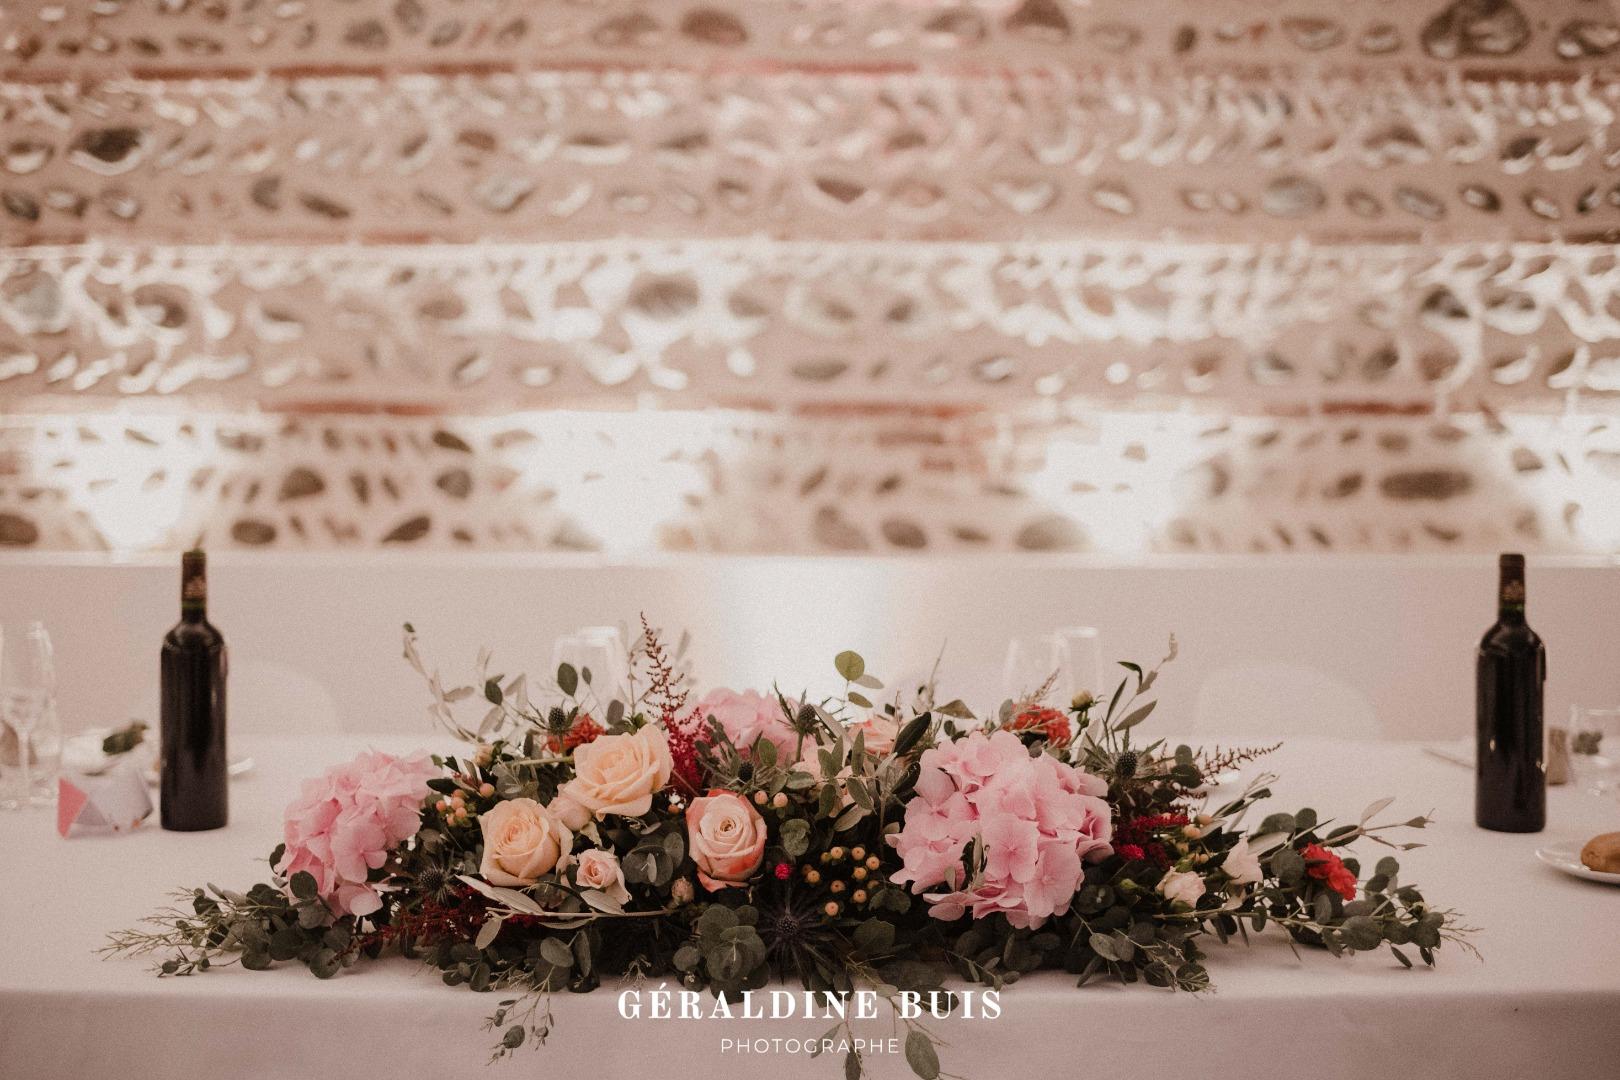 Chemin de table fleuri La Dolce Vita Organisation Mariage Toulouse.jpg